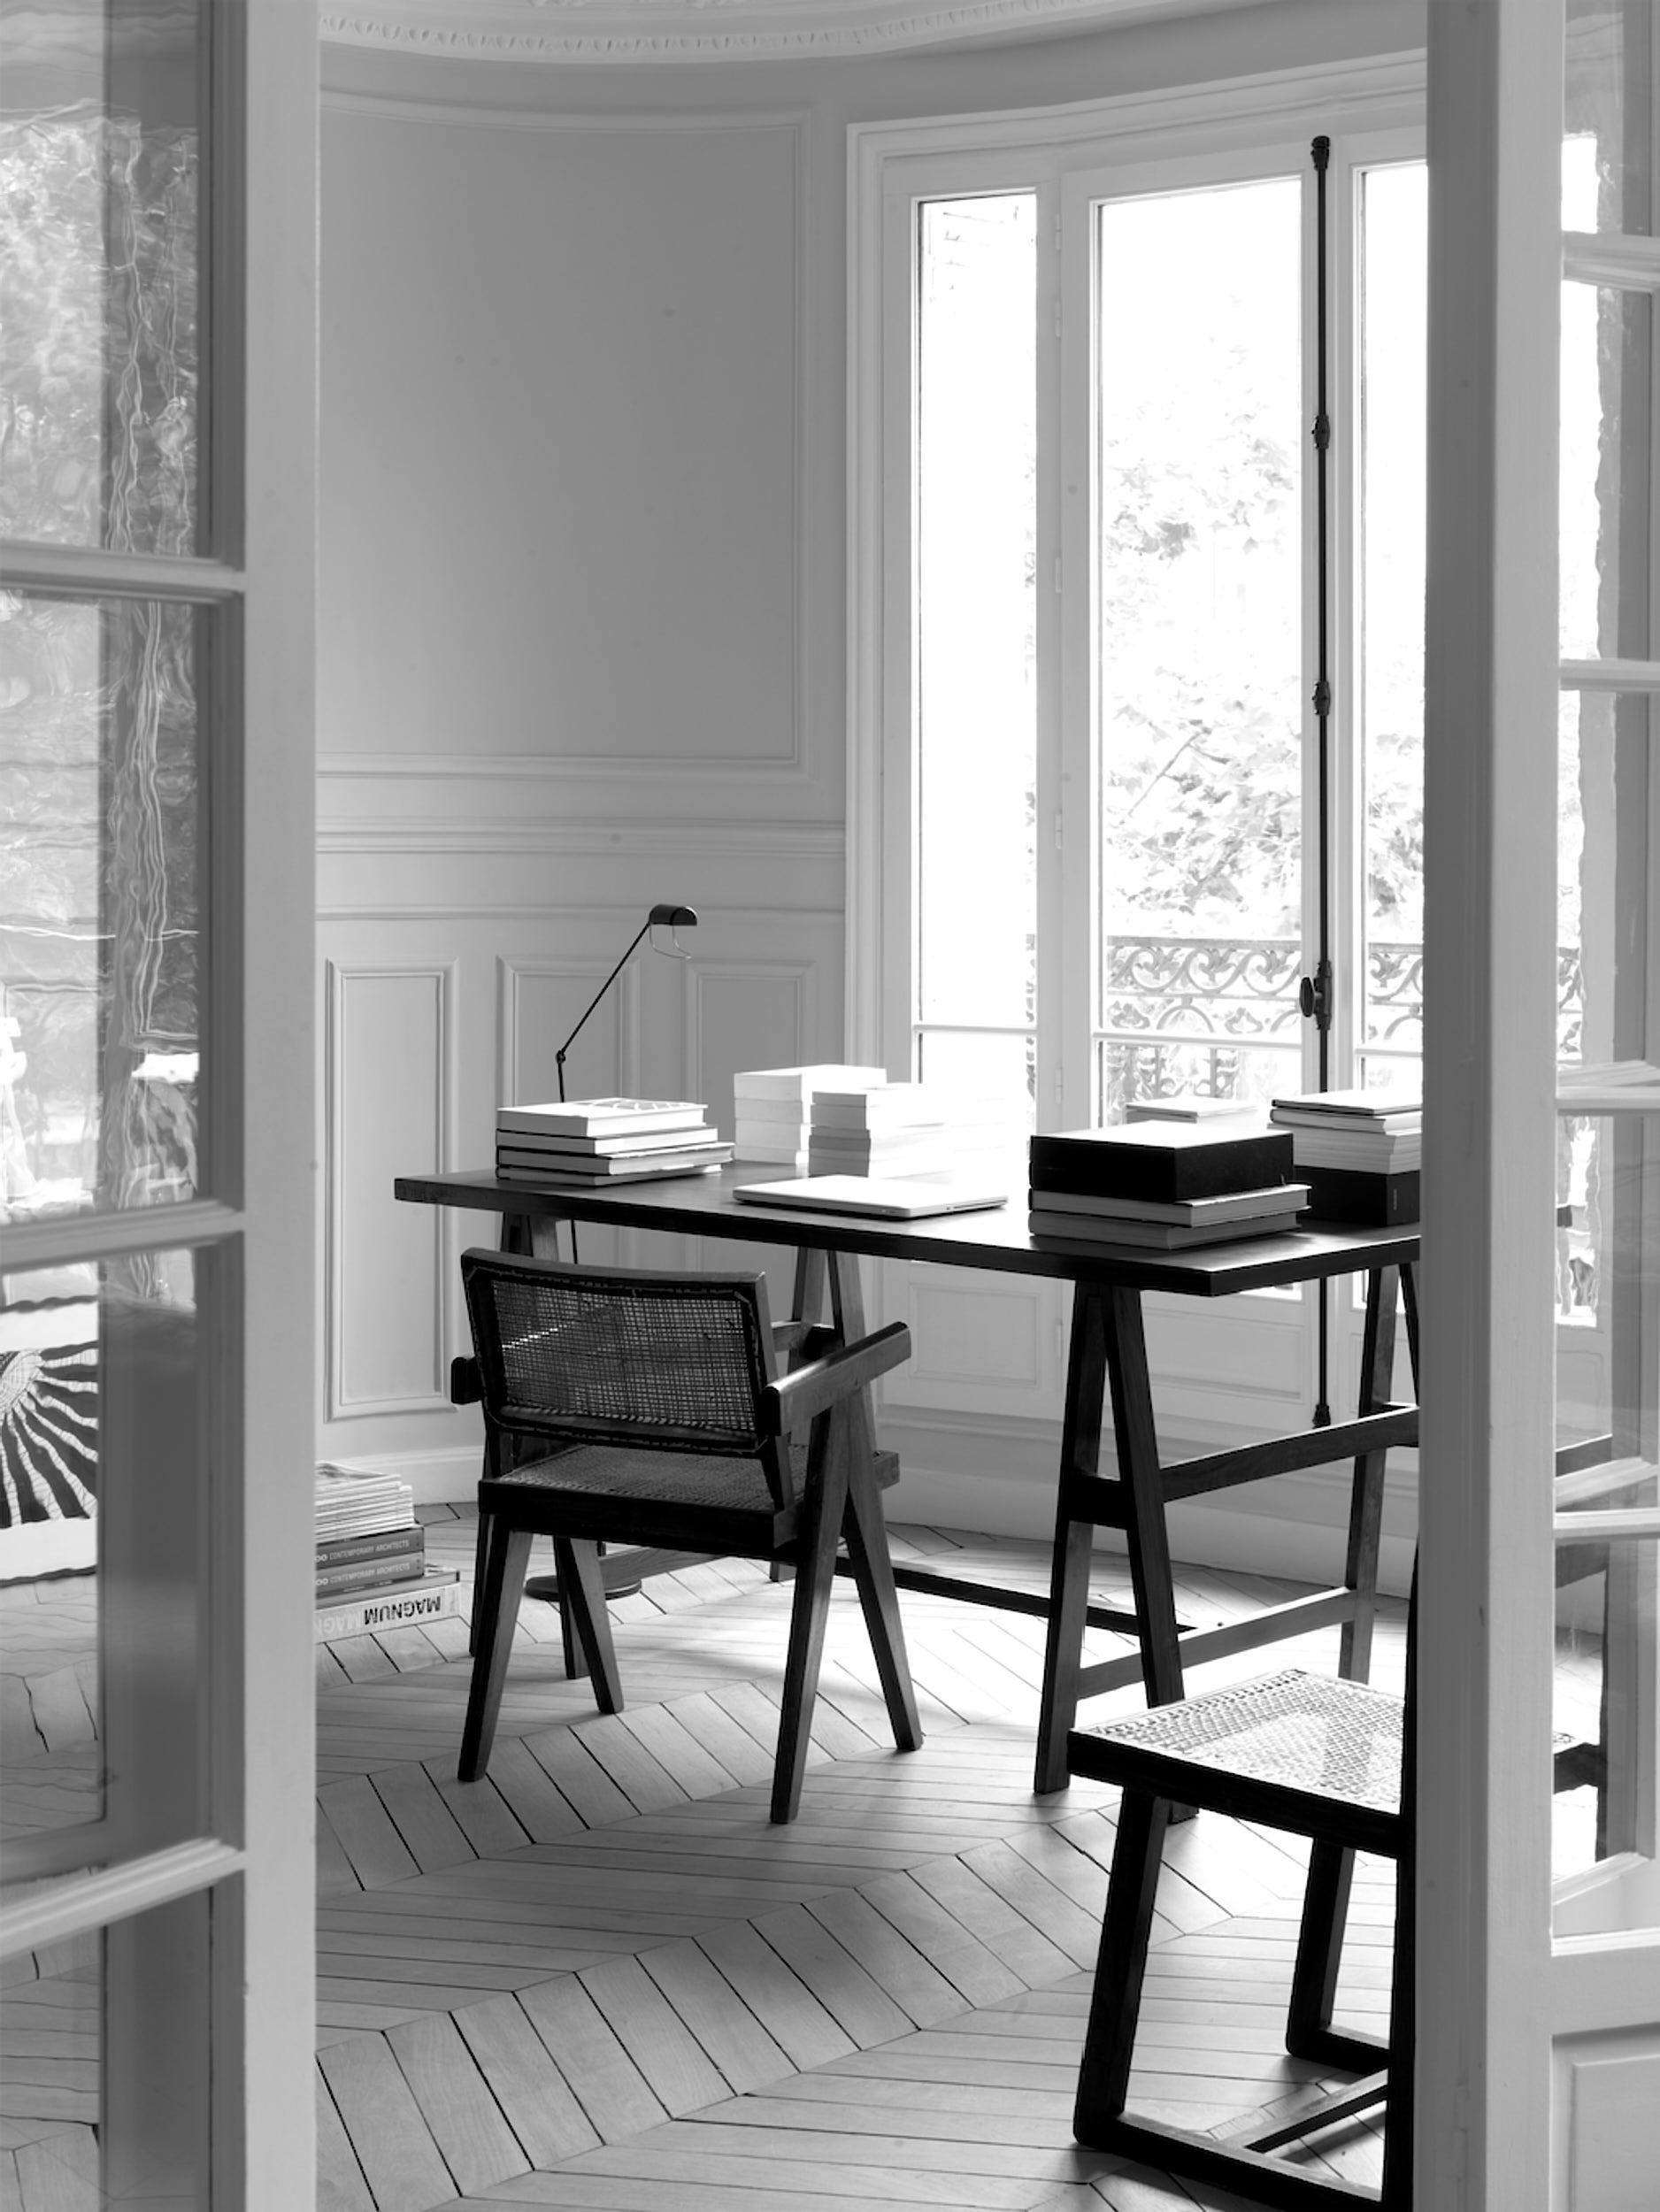 RK Apartement by Nicolas Schuybroek — Photo by Claessens & Deschamps